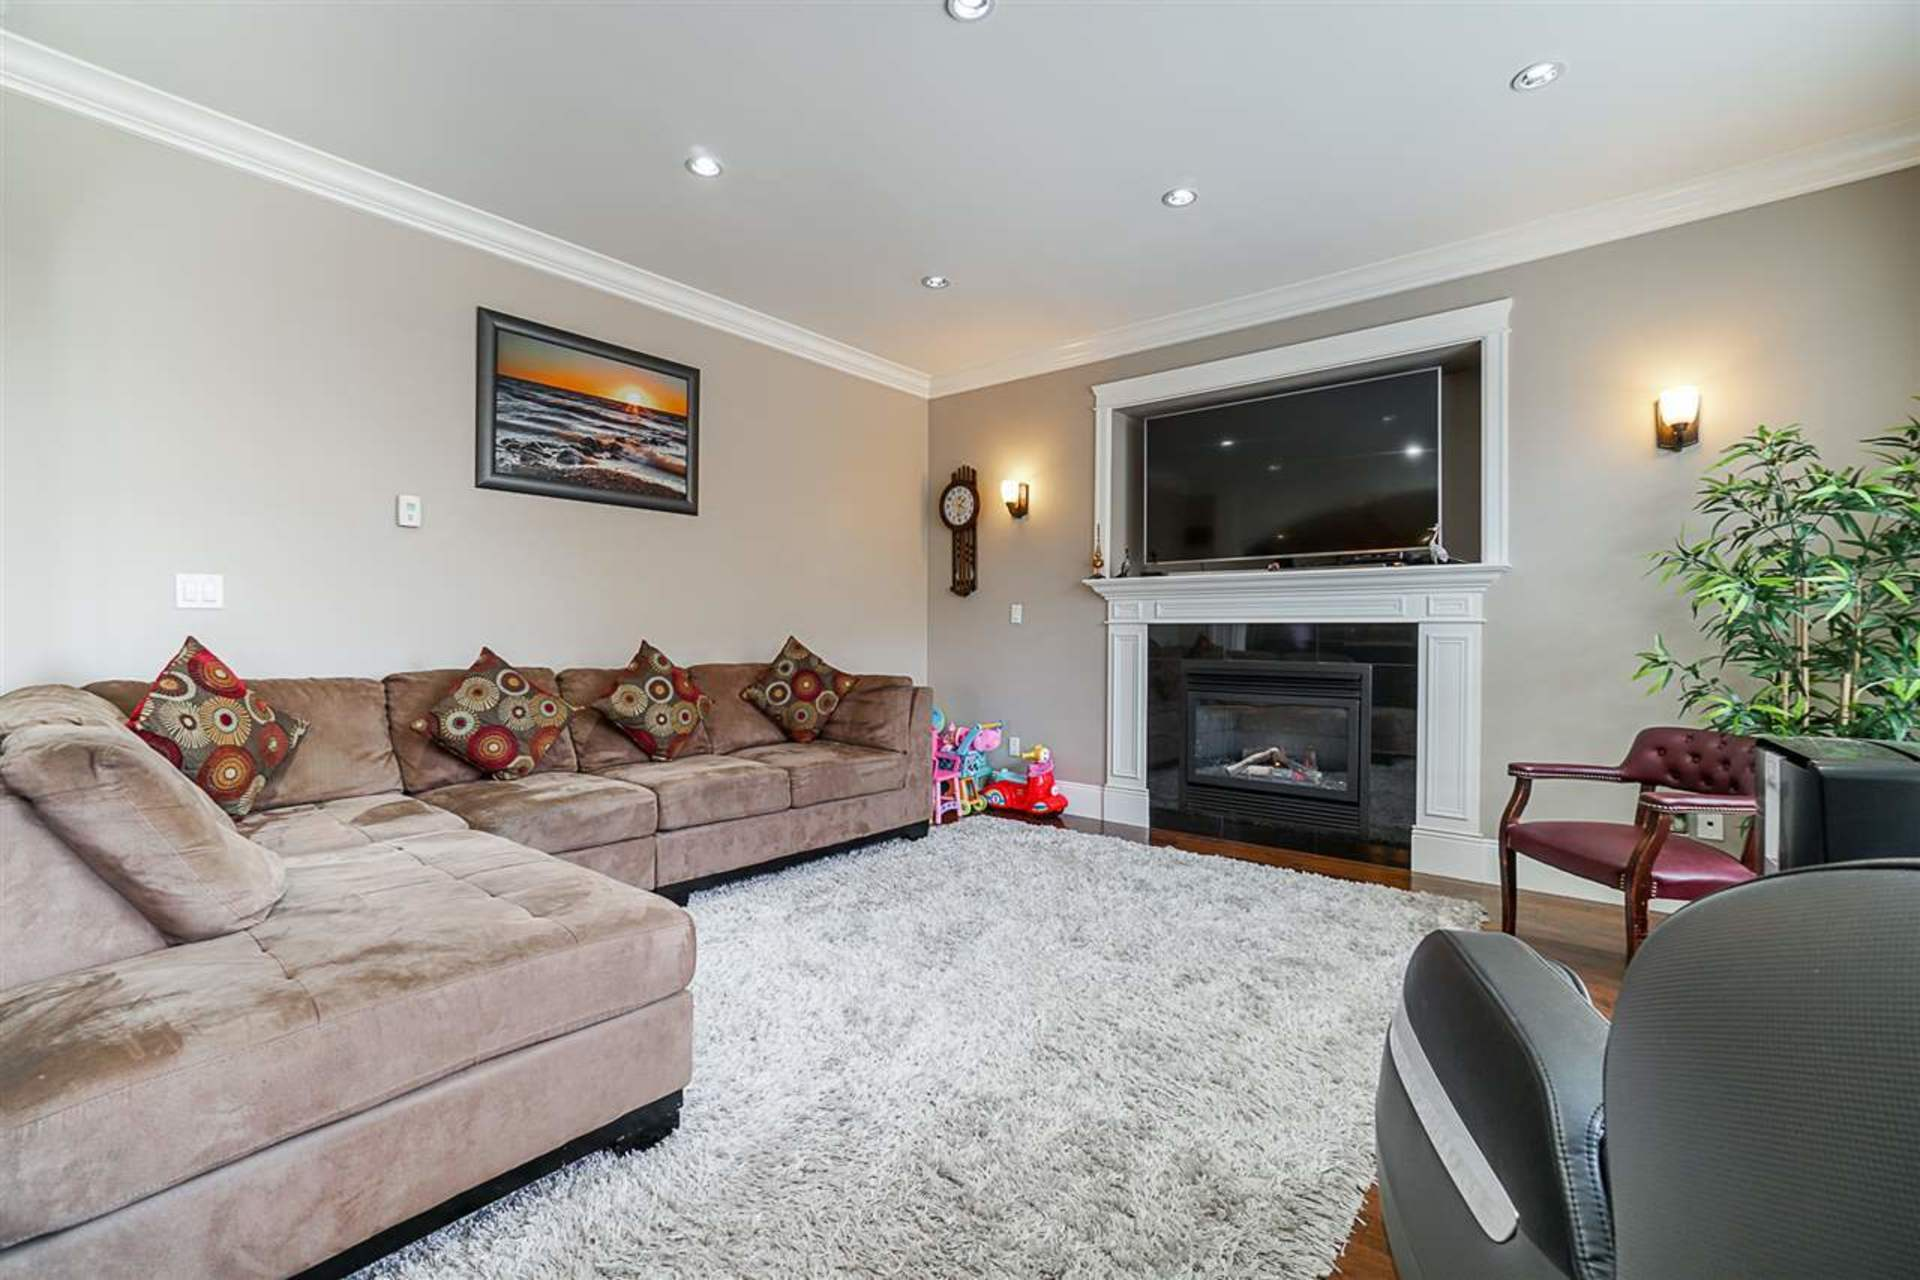 2110-edinburgh-street-connaught-heights-new-westminster-07 at 2110 Edinburgh Street, Connaught Heights, New Westminster